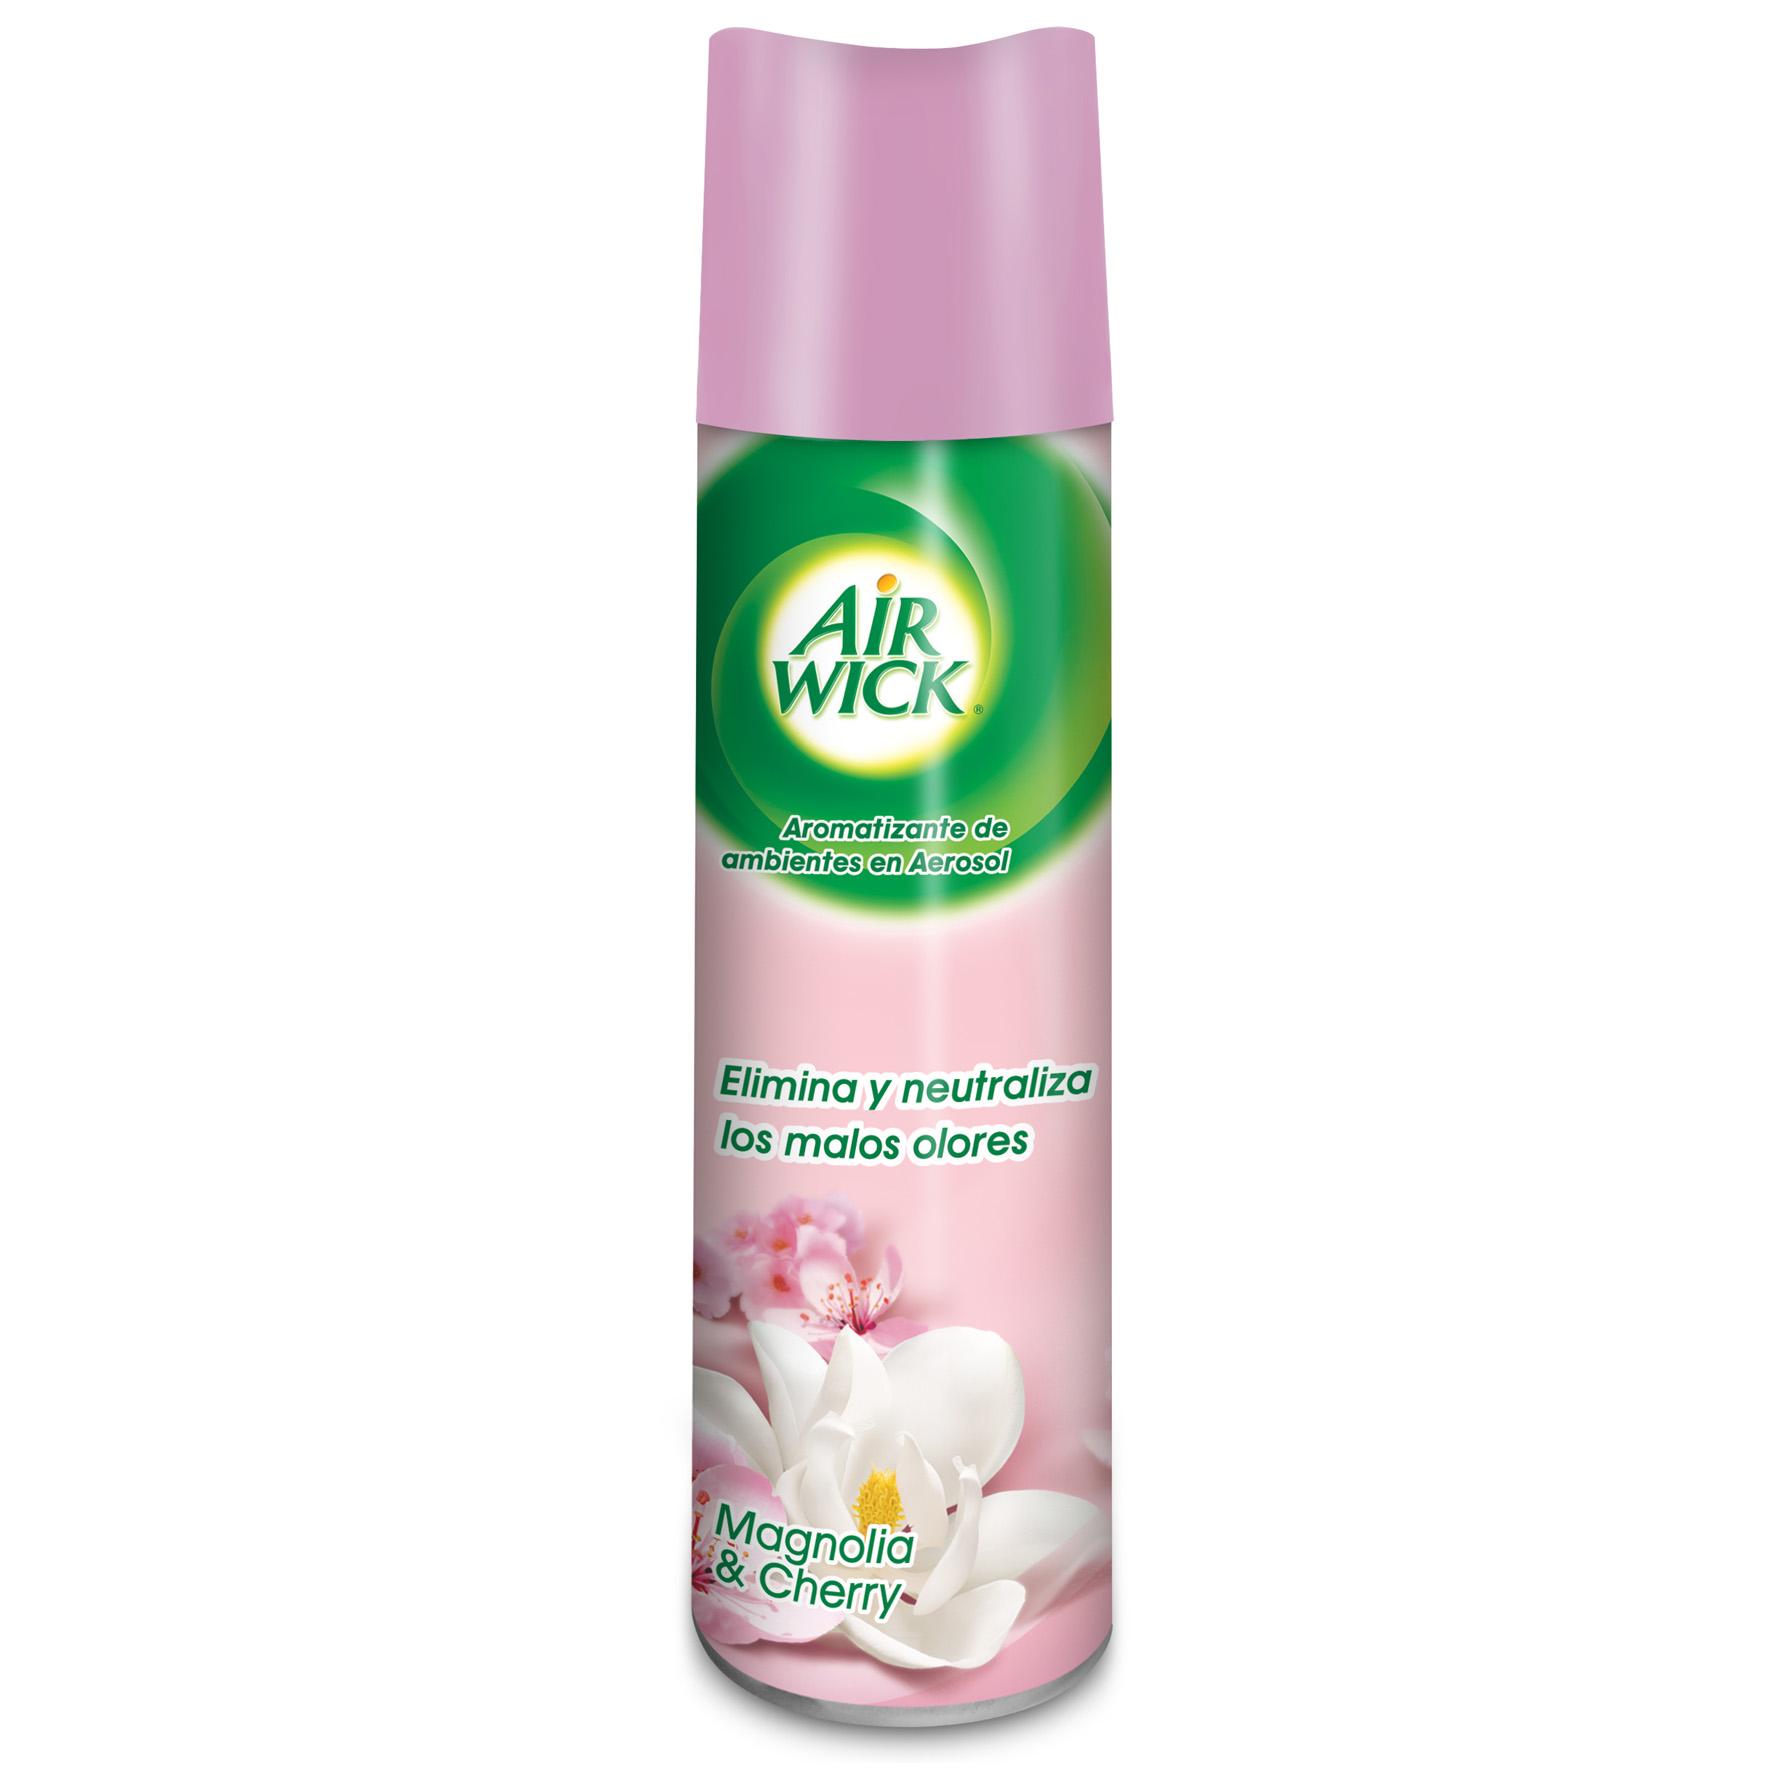 Air Wick® Aerosol Magnoli & Cherry Blossom 226g